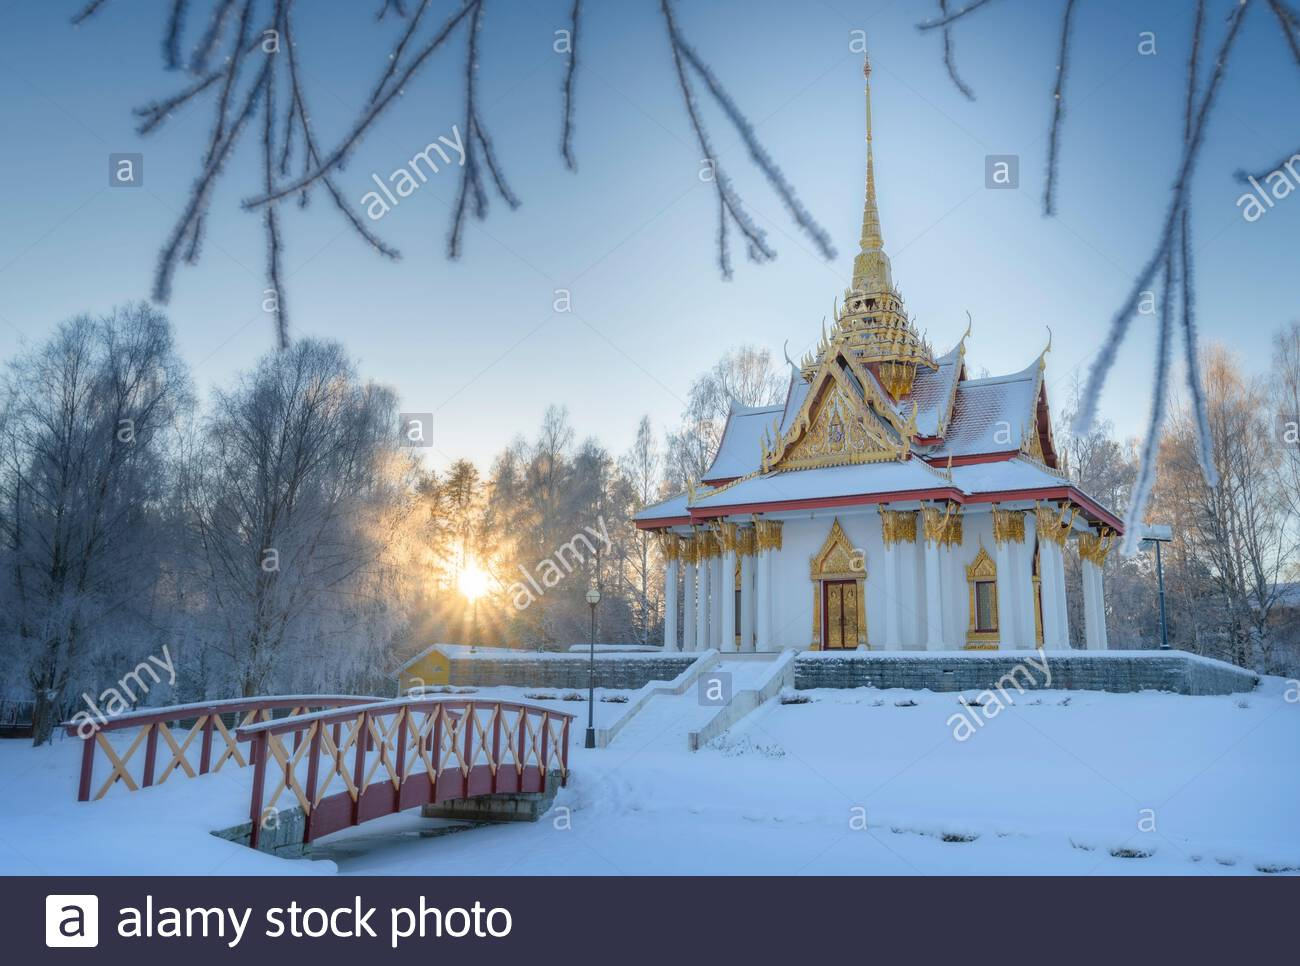 Thai paviljong with an bridge standing in utanede in Sweden Stock Photo